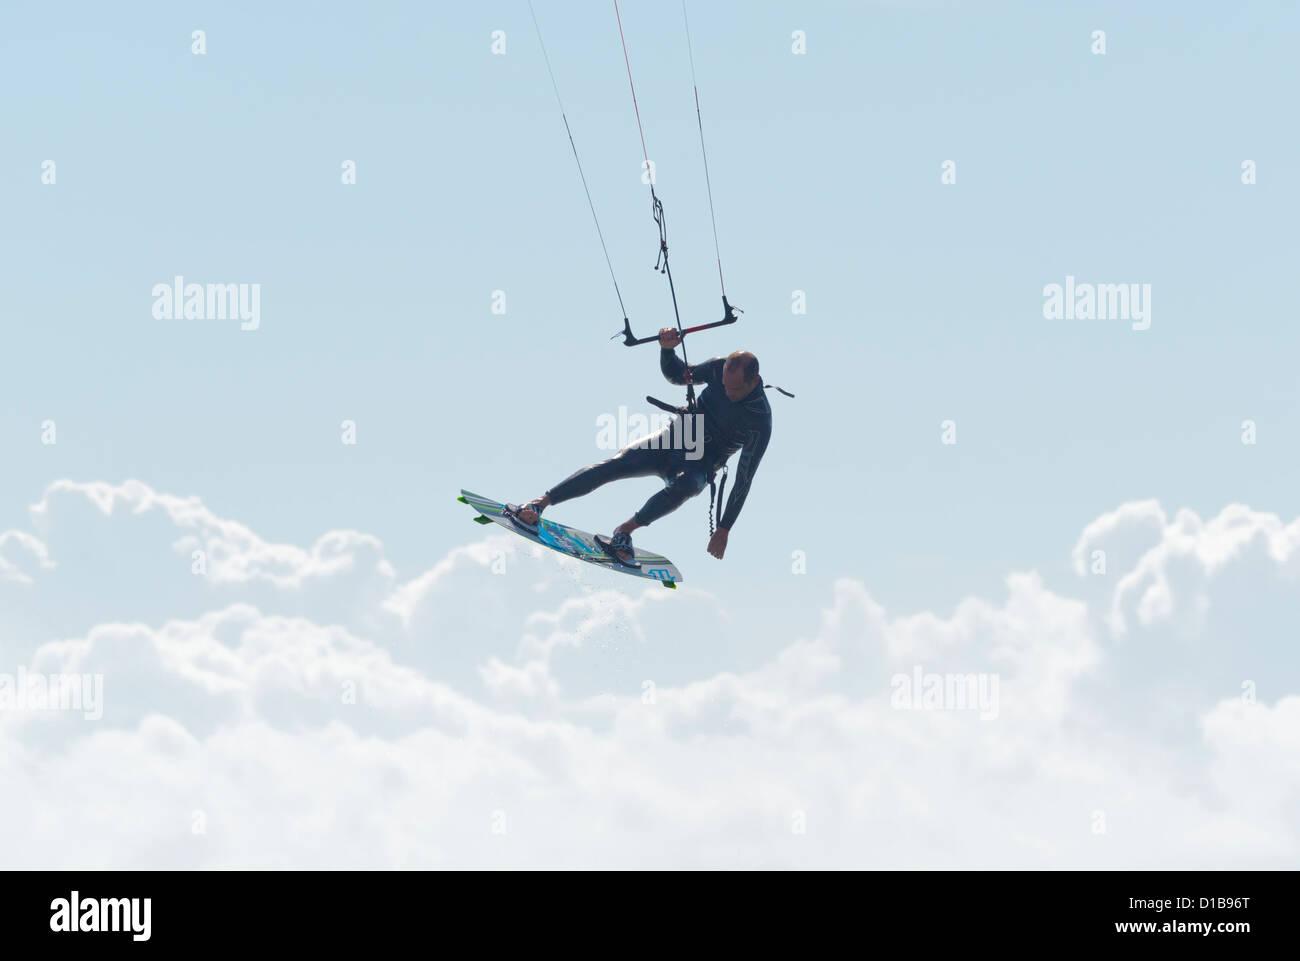 Kitesurfer in big jumpTarifa, Costa de la Luz, Cadiz, Andalusia, Spain. - Stock Image